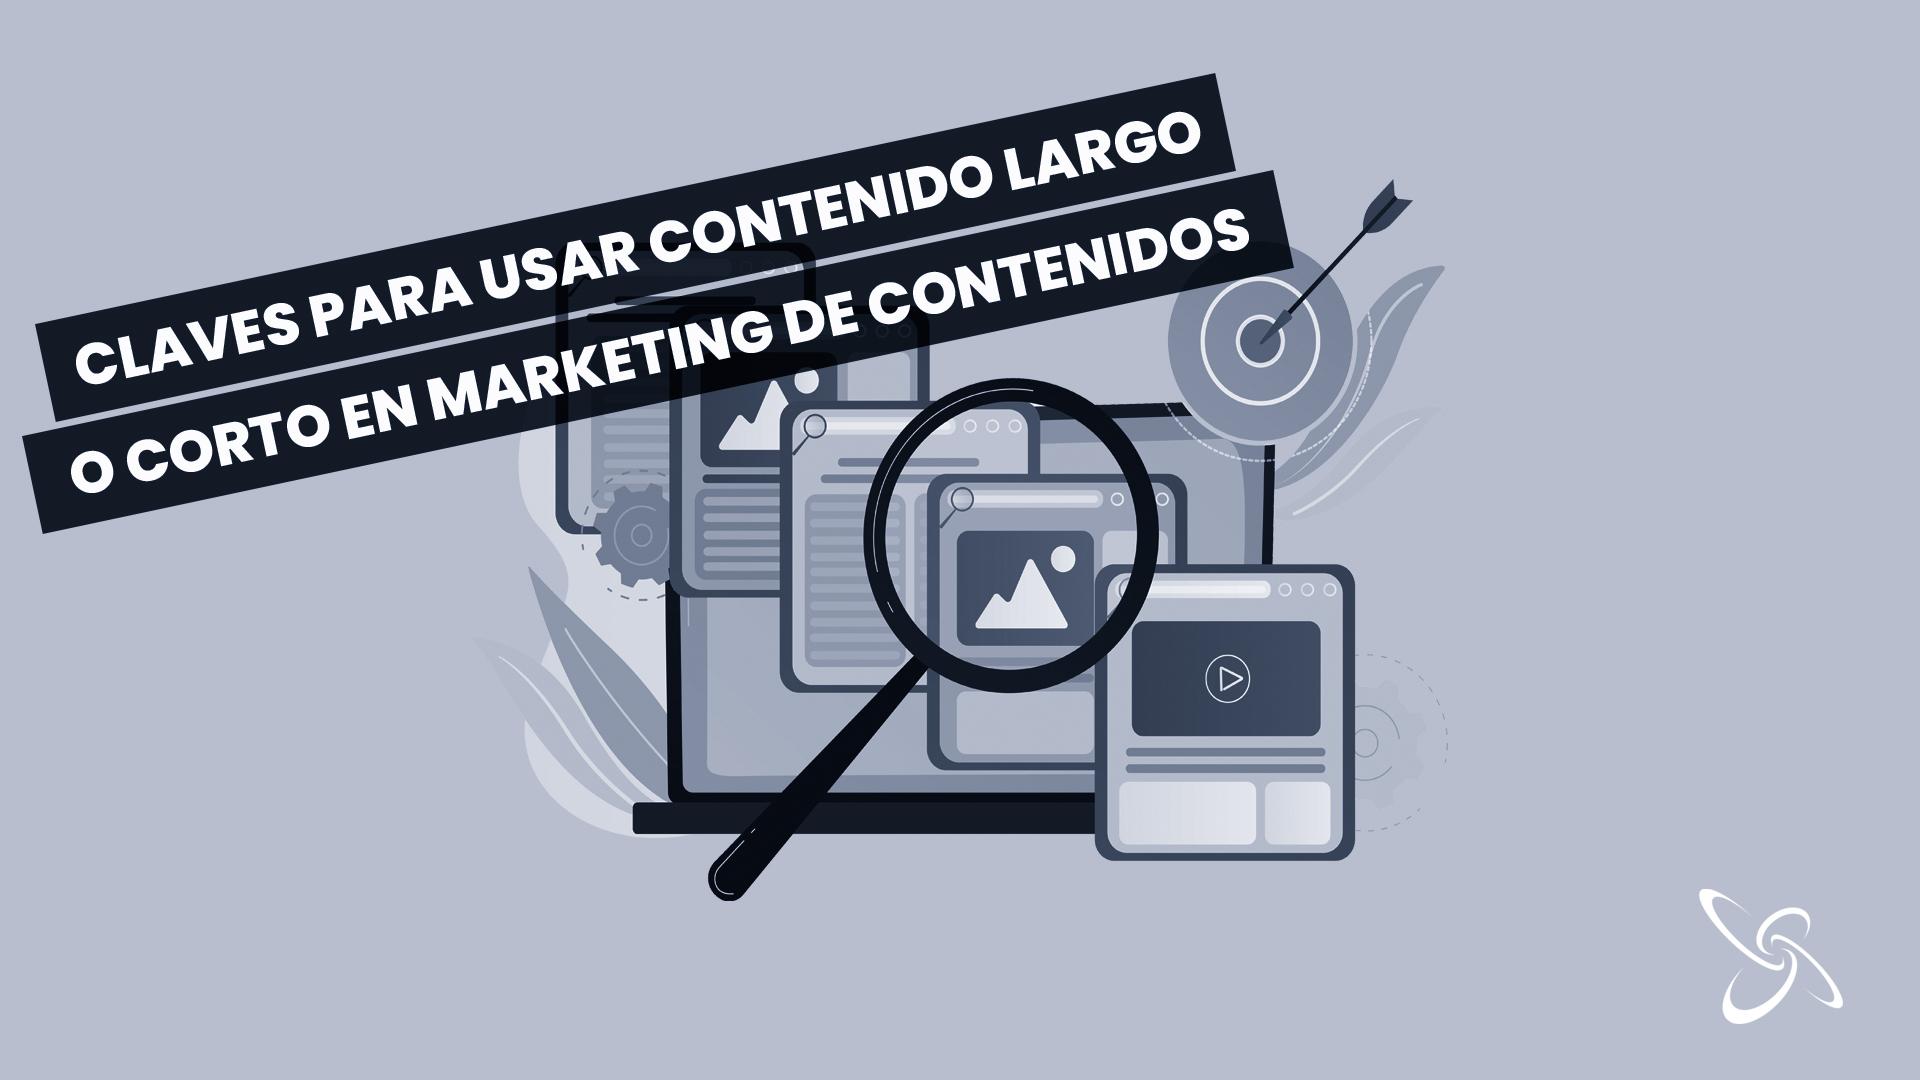 claves para usar contenido largo o corto en marketing de contenidos